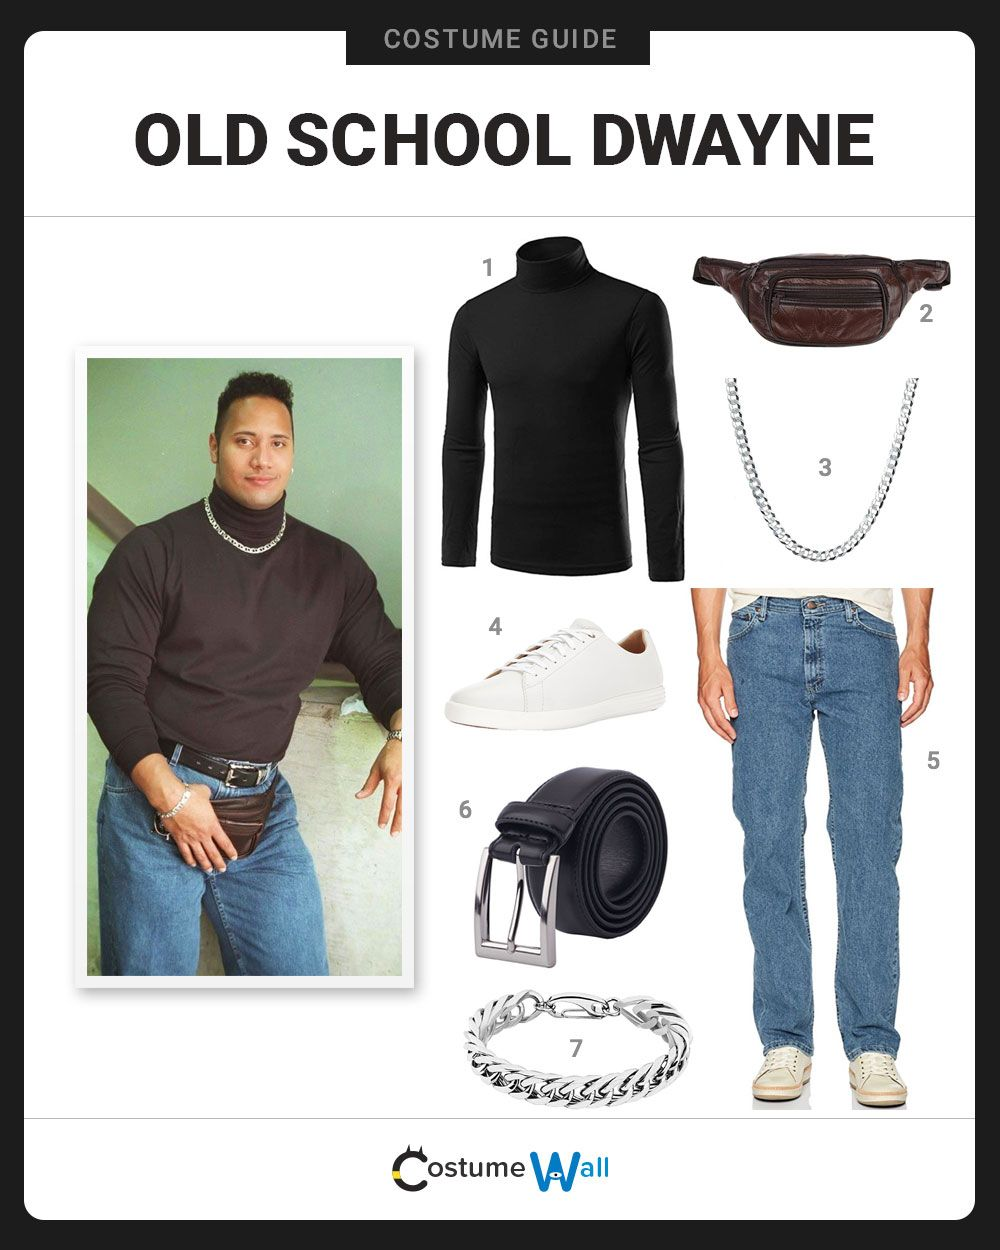 Dress Like Old School Dwayne Costume And Cosplay Guide Meme